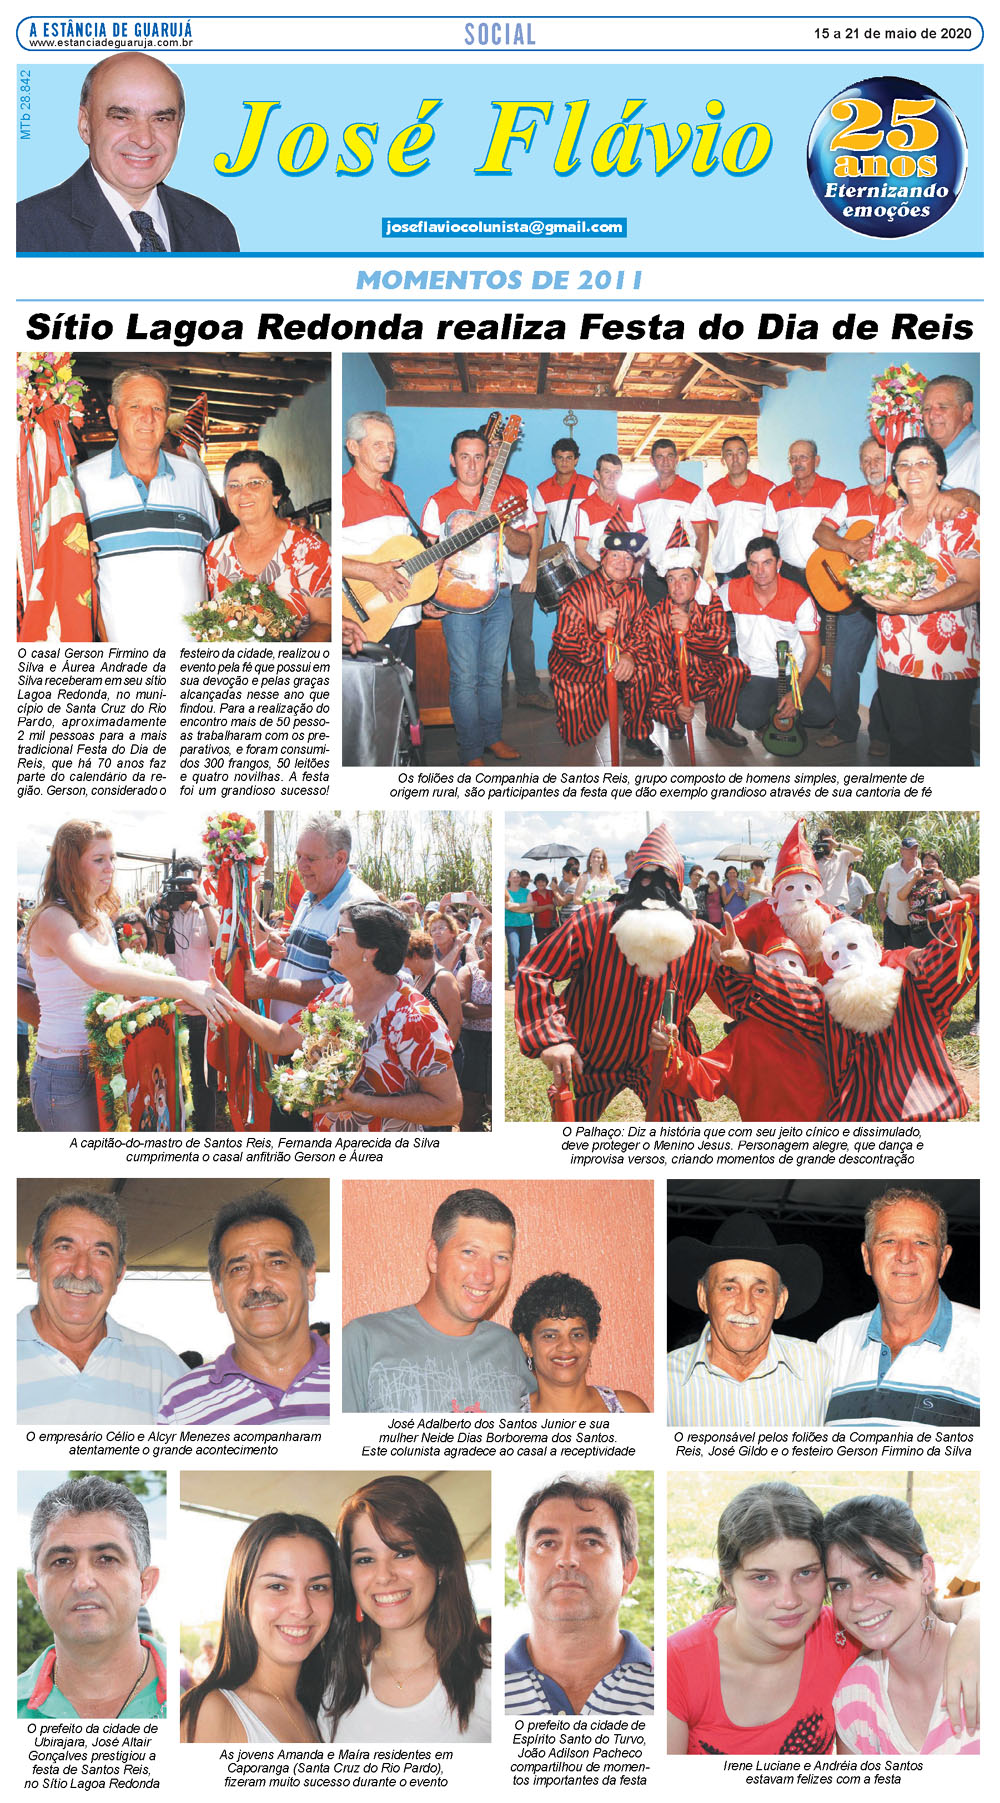 Sítio Lagoa Redonda realiza Festa do Dia de Reis